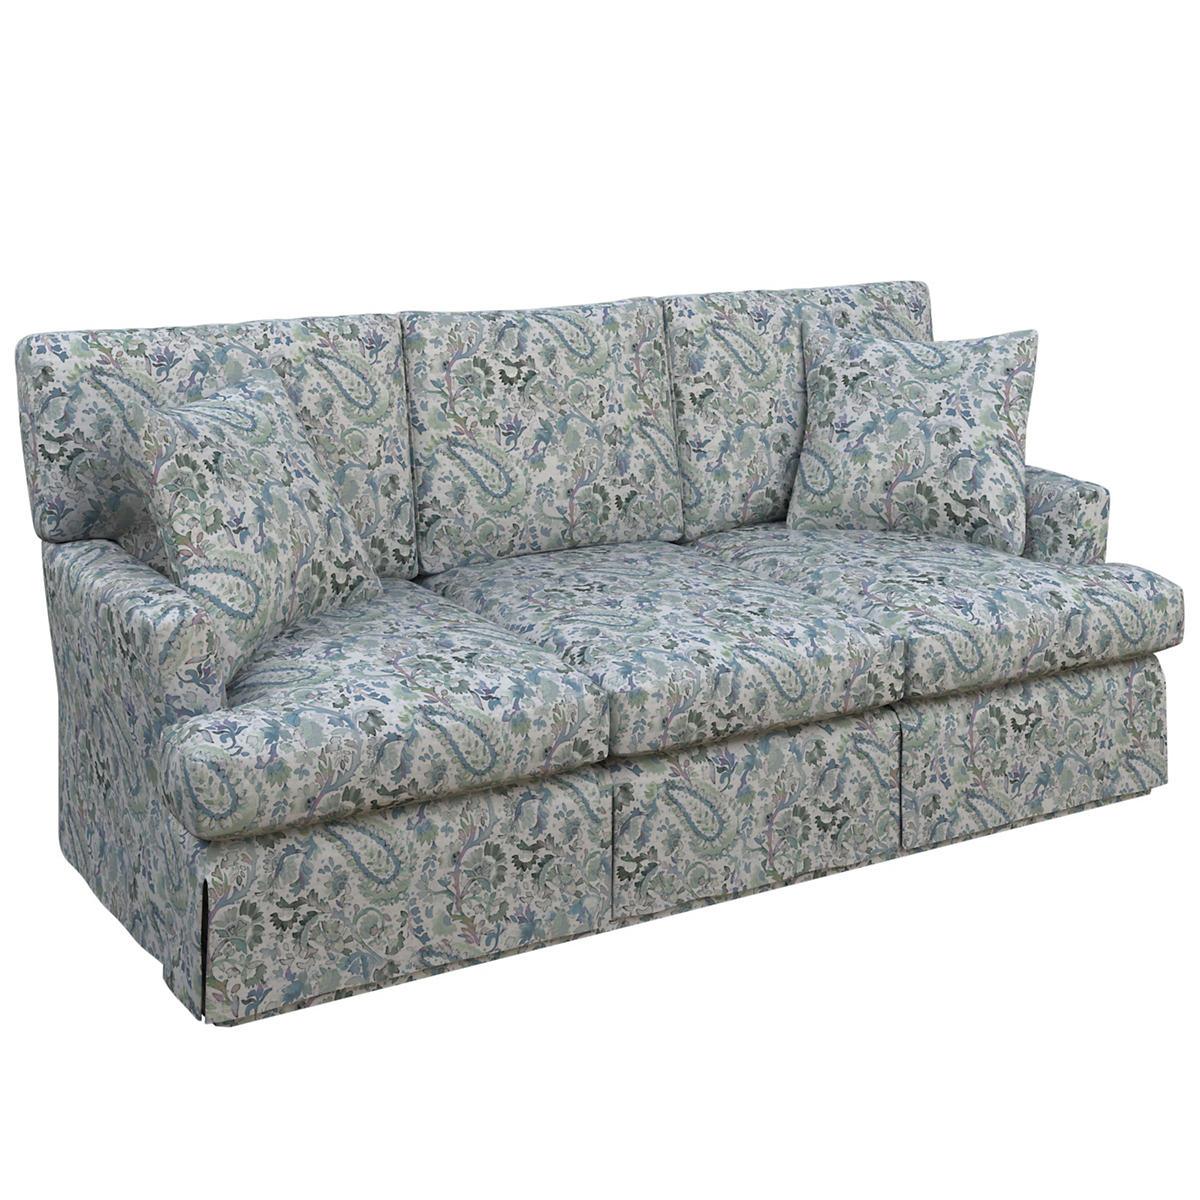 Ines Linen Blue Saybrook 3 Seater Sofa